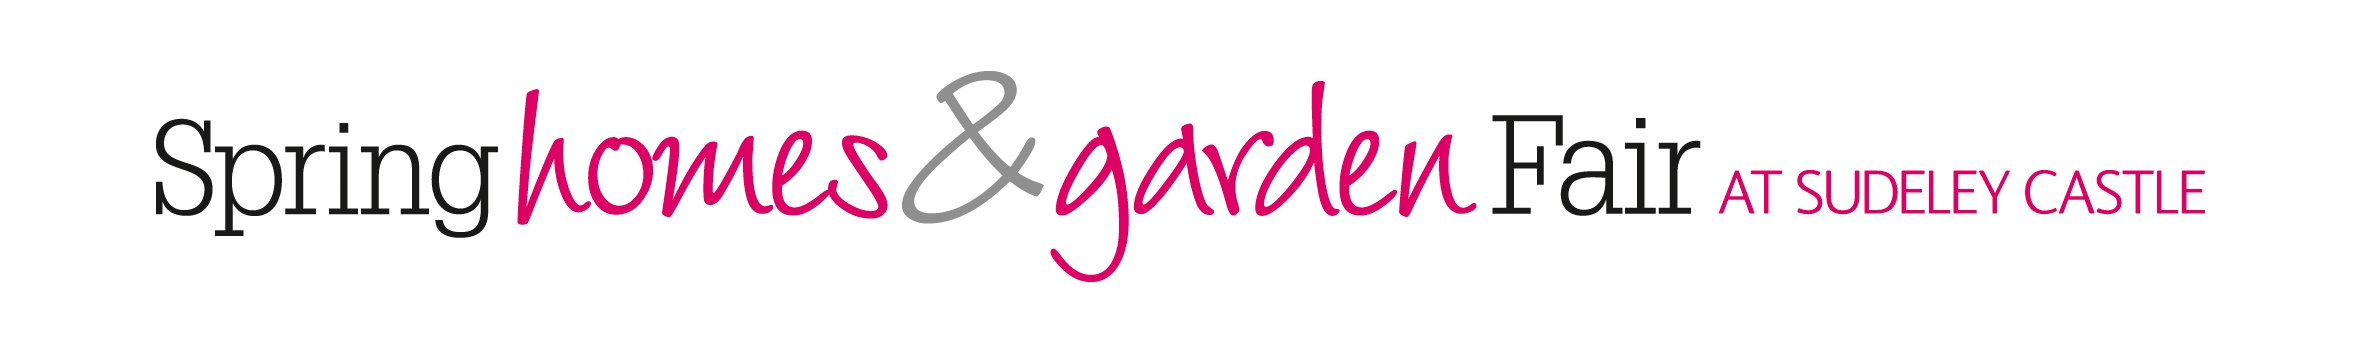 Spring Homes and Garden Fair, Sudely Castle